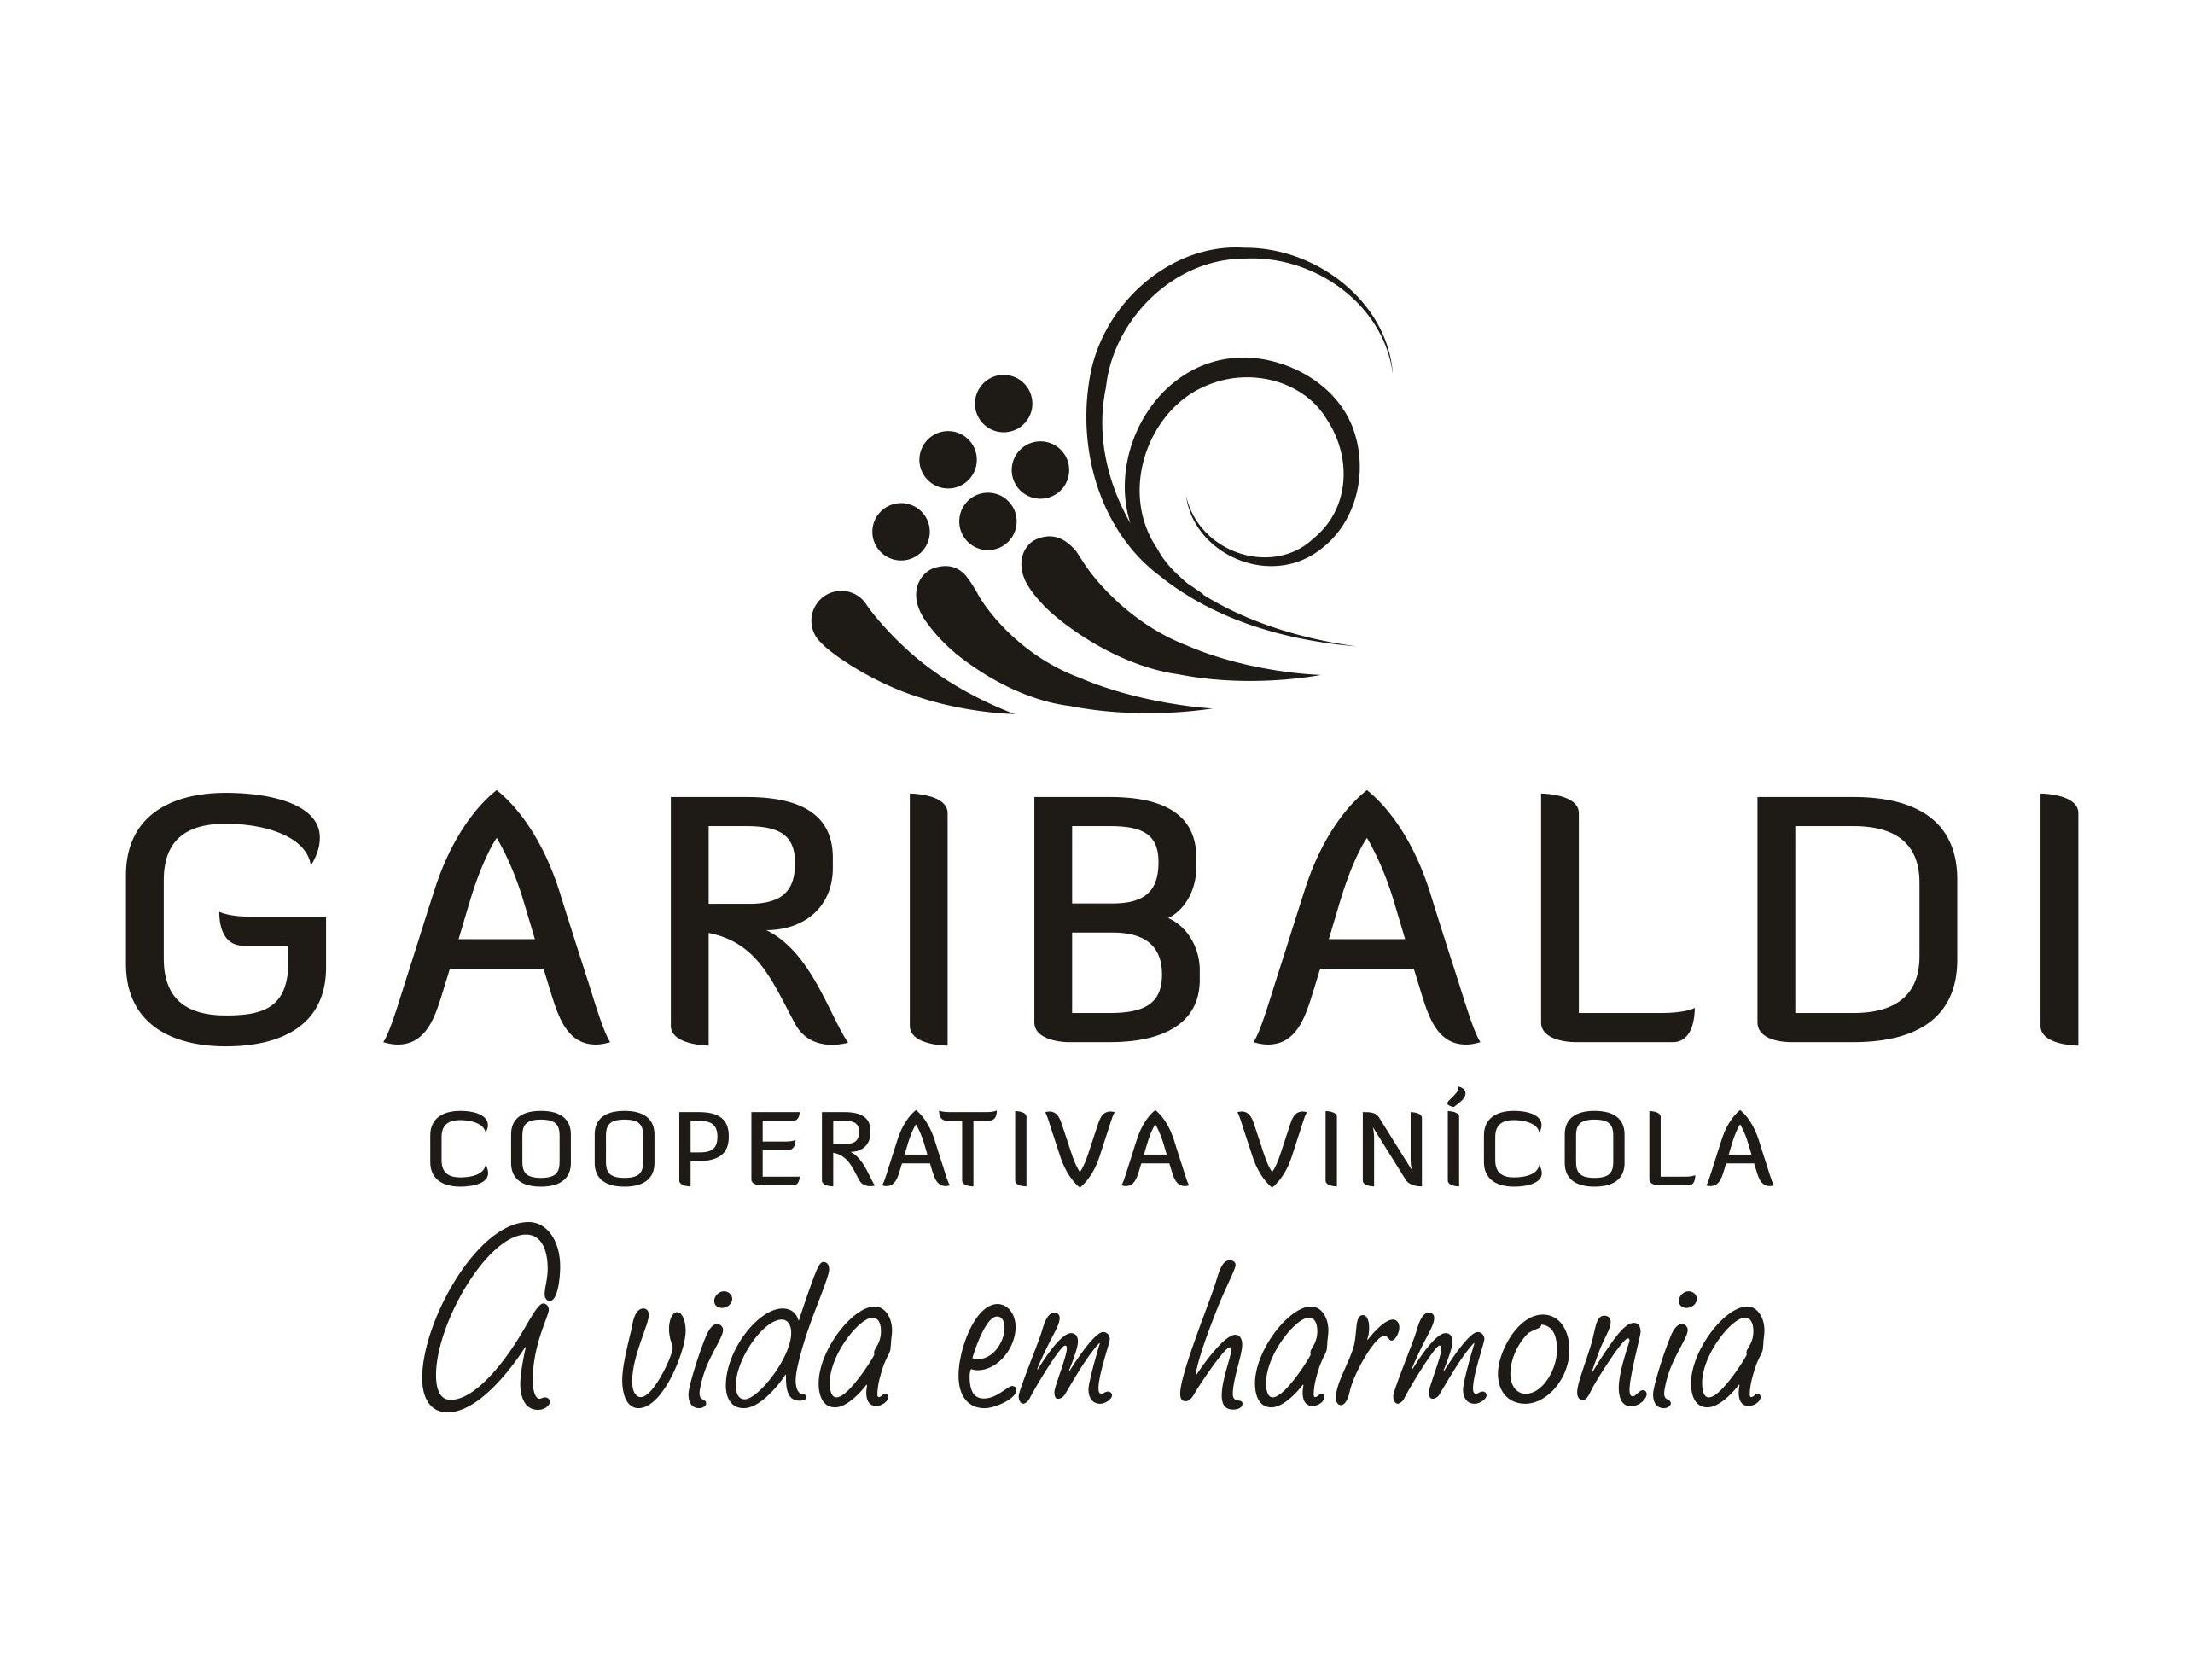 Logotipo Cooperativa Vinícola Garibaldi